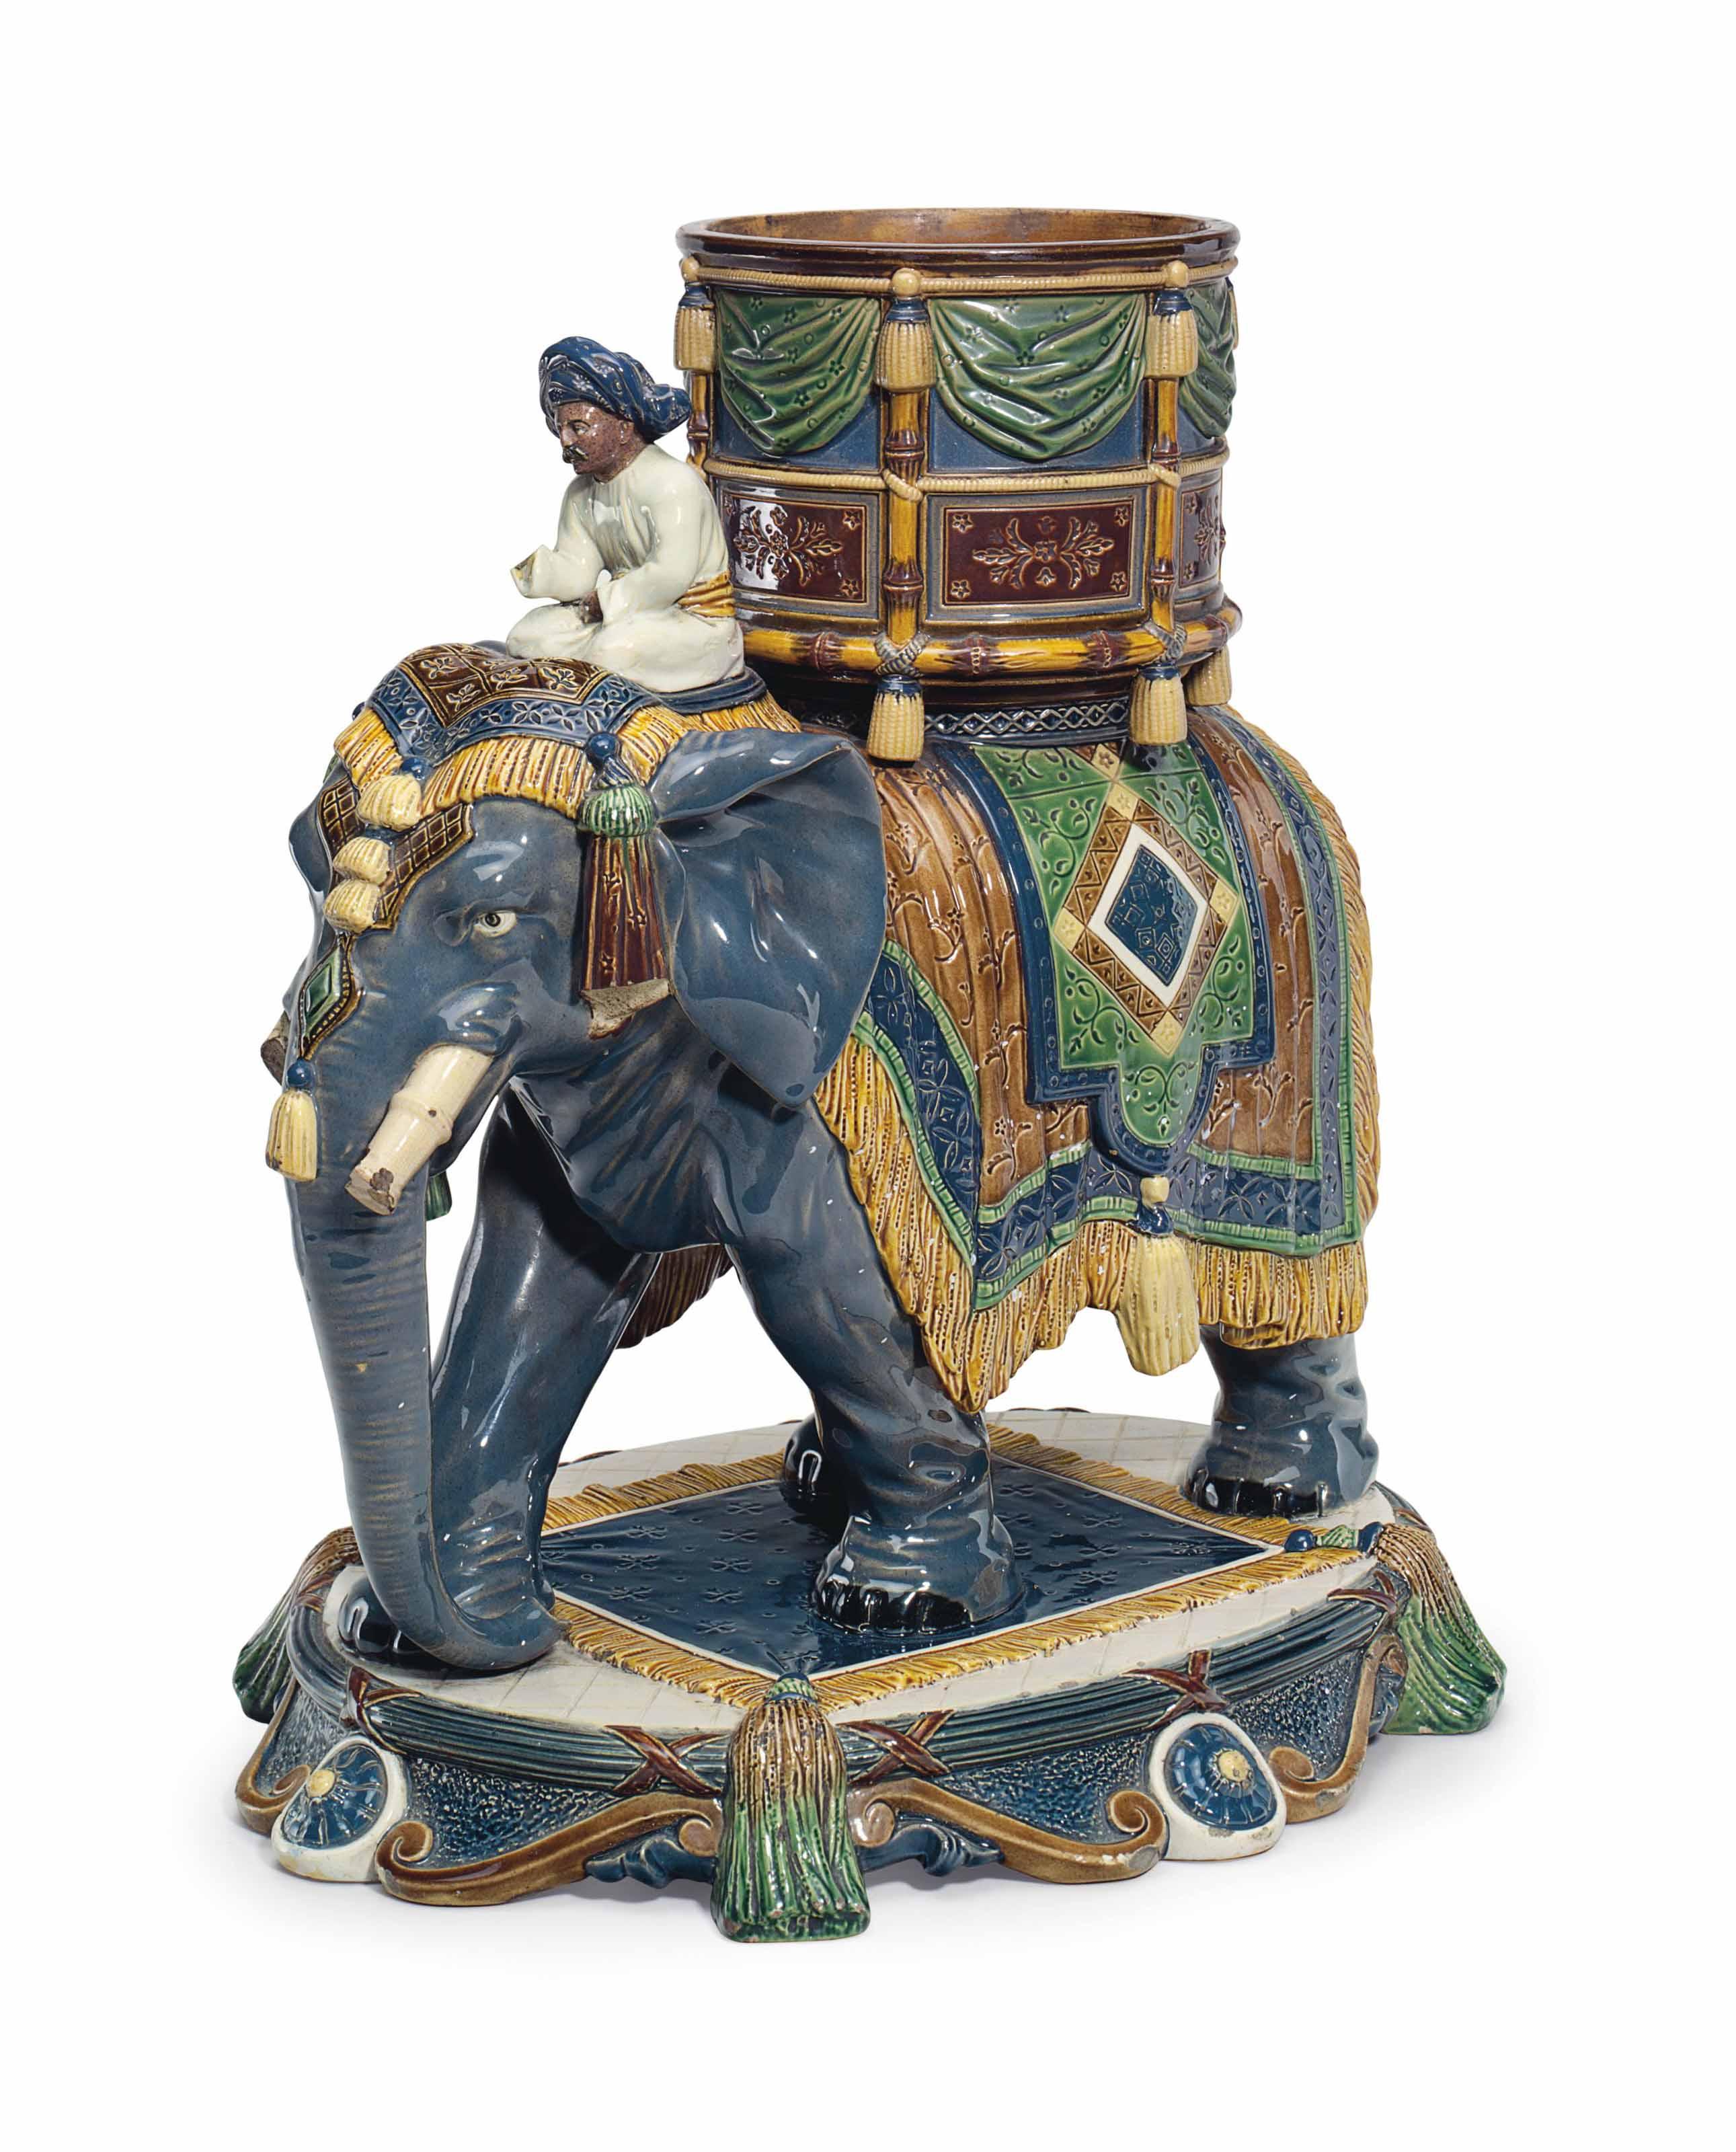 A GERBING & STEPHAN MAJOLICA ELEPHANT AND MAHOUT FORM JARDINIERE